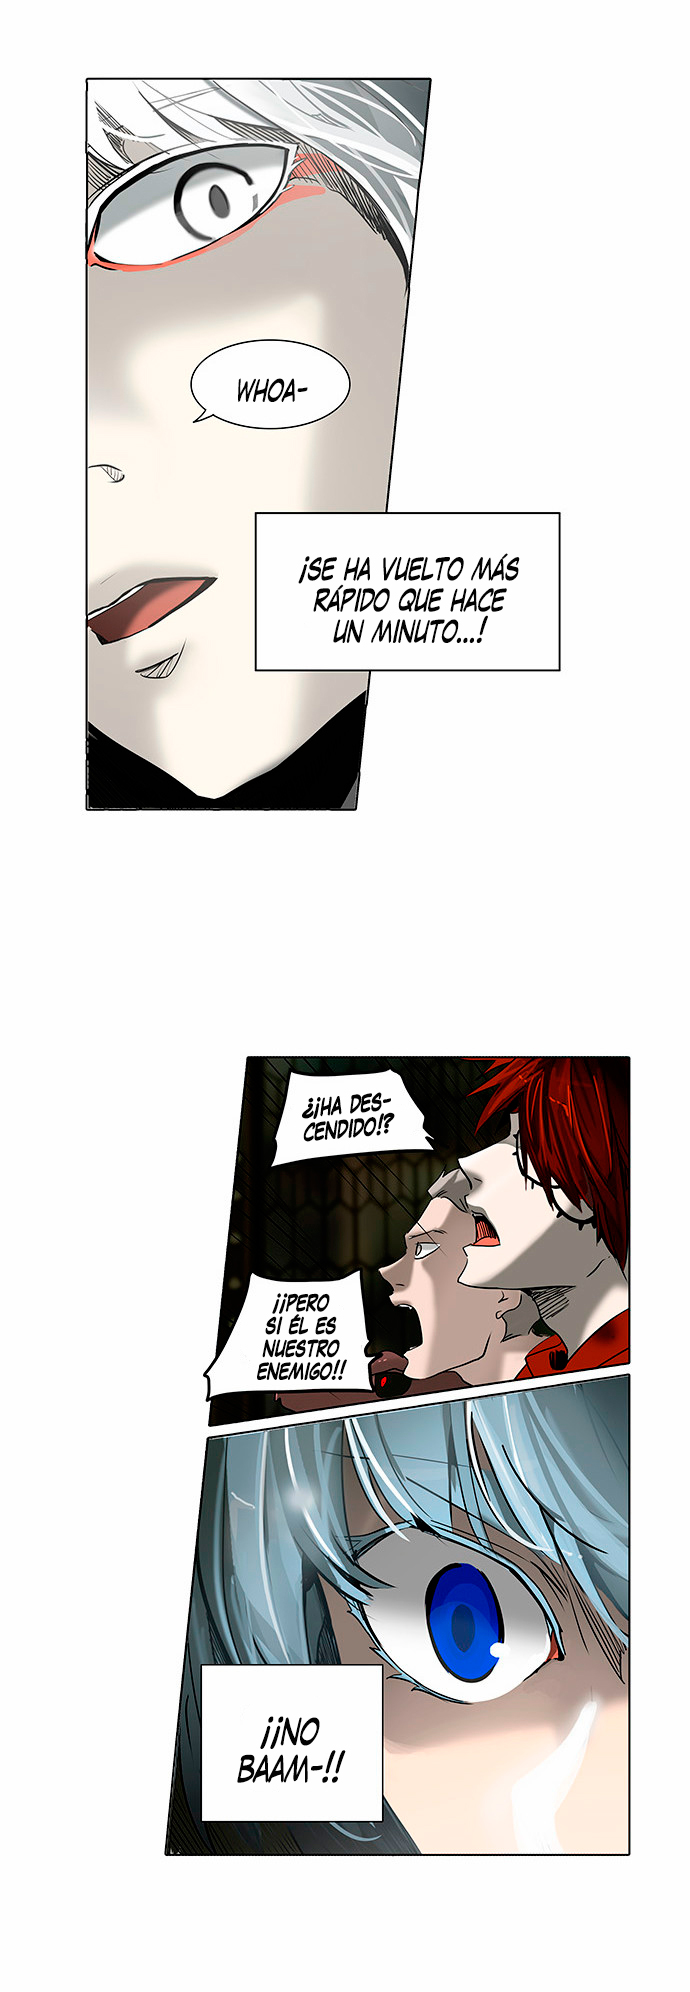 http://c5.ninemanga.com/es_manga/21/149/445885/f63cc4f98d60cd15b152176a2fc8f190.jpg Page 9